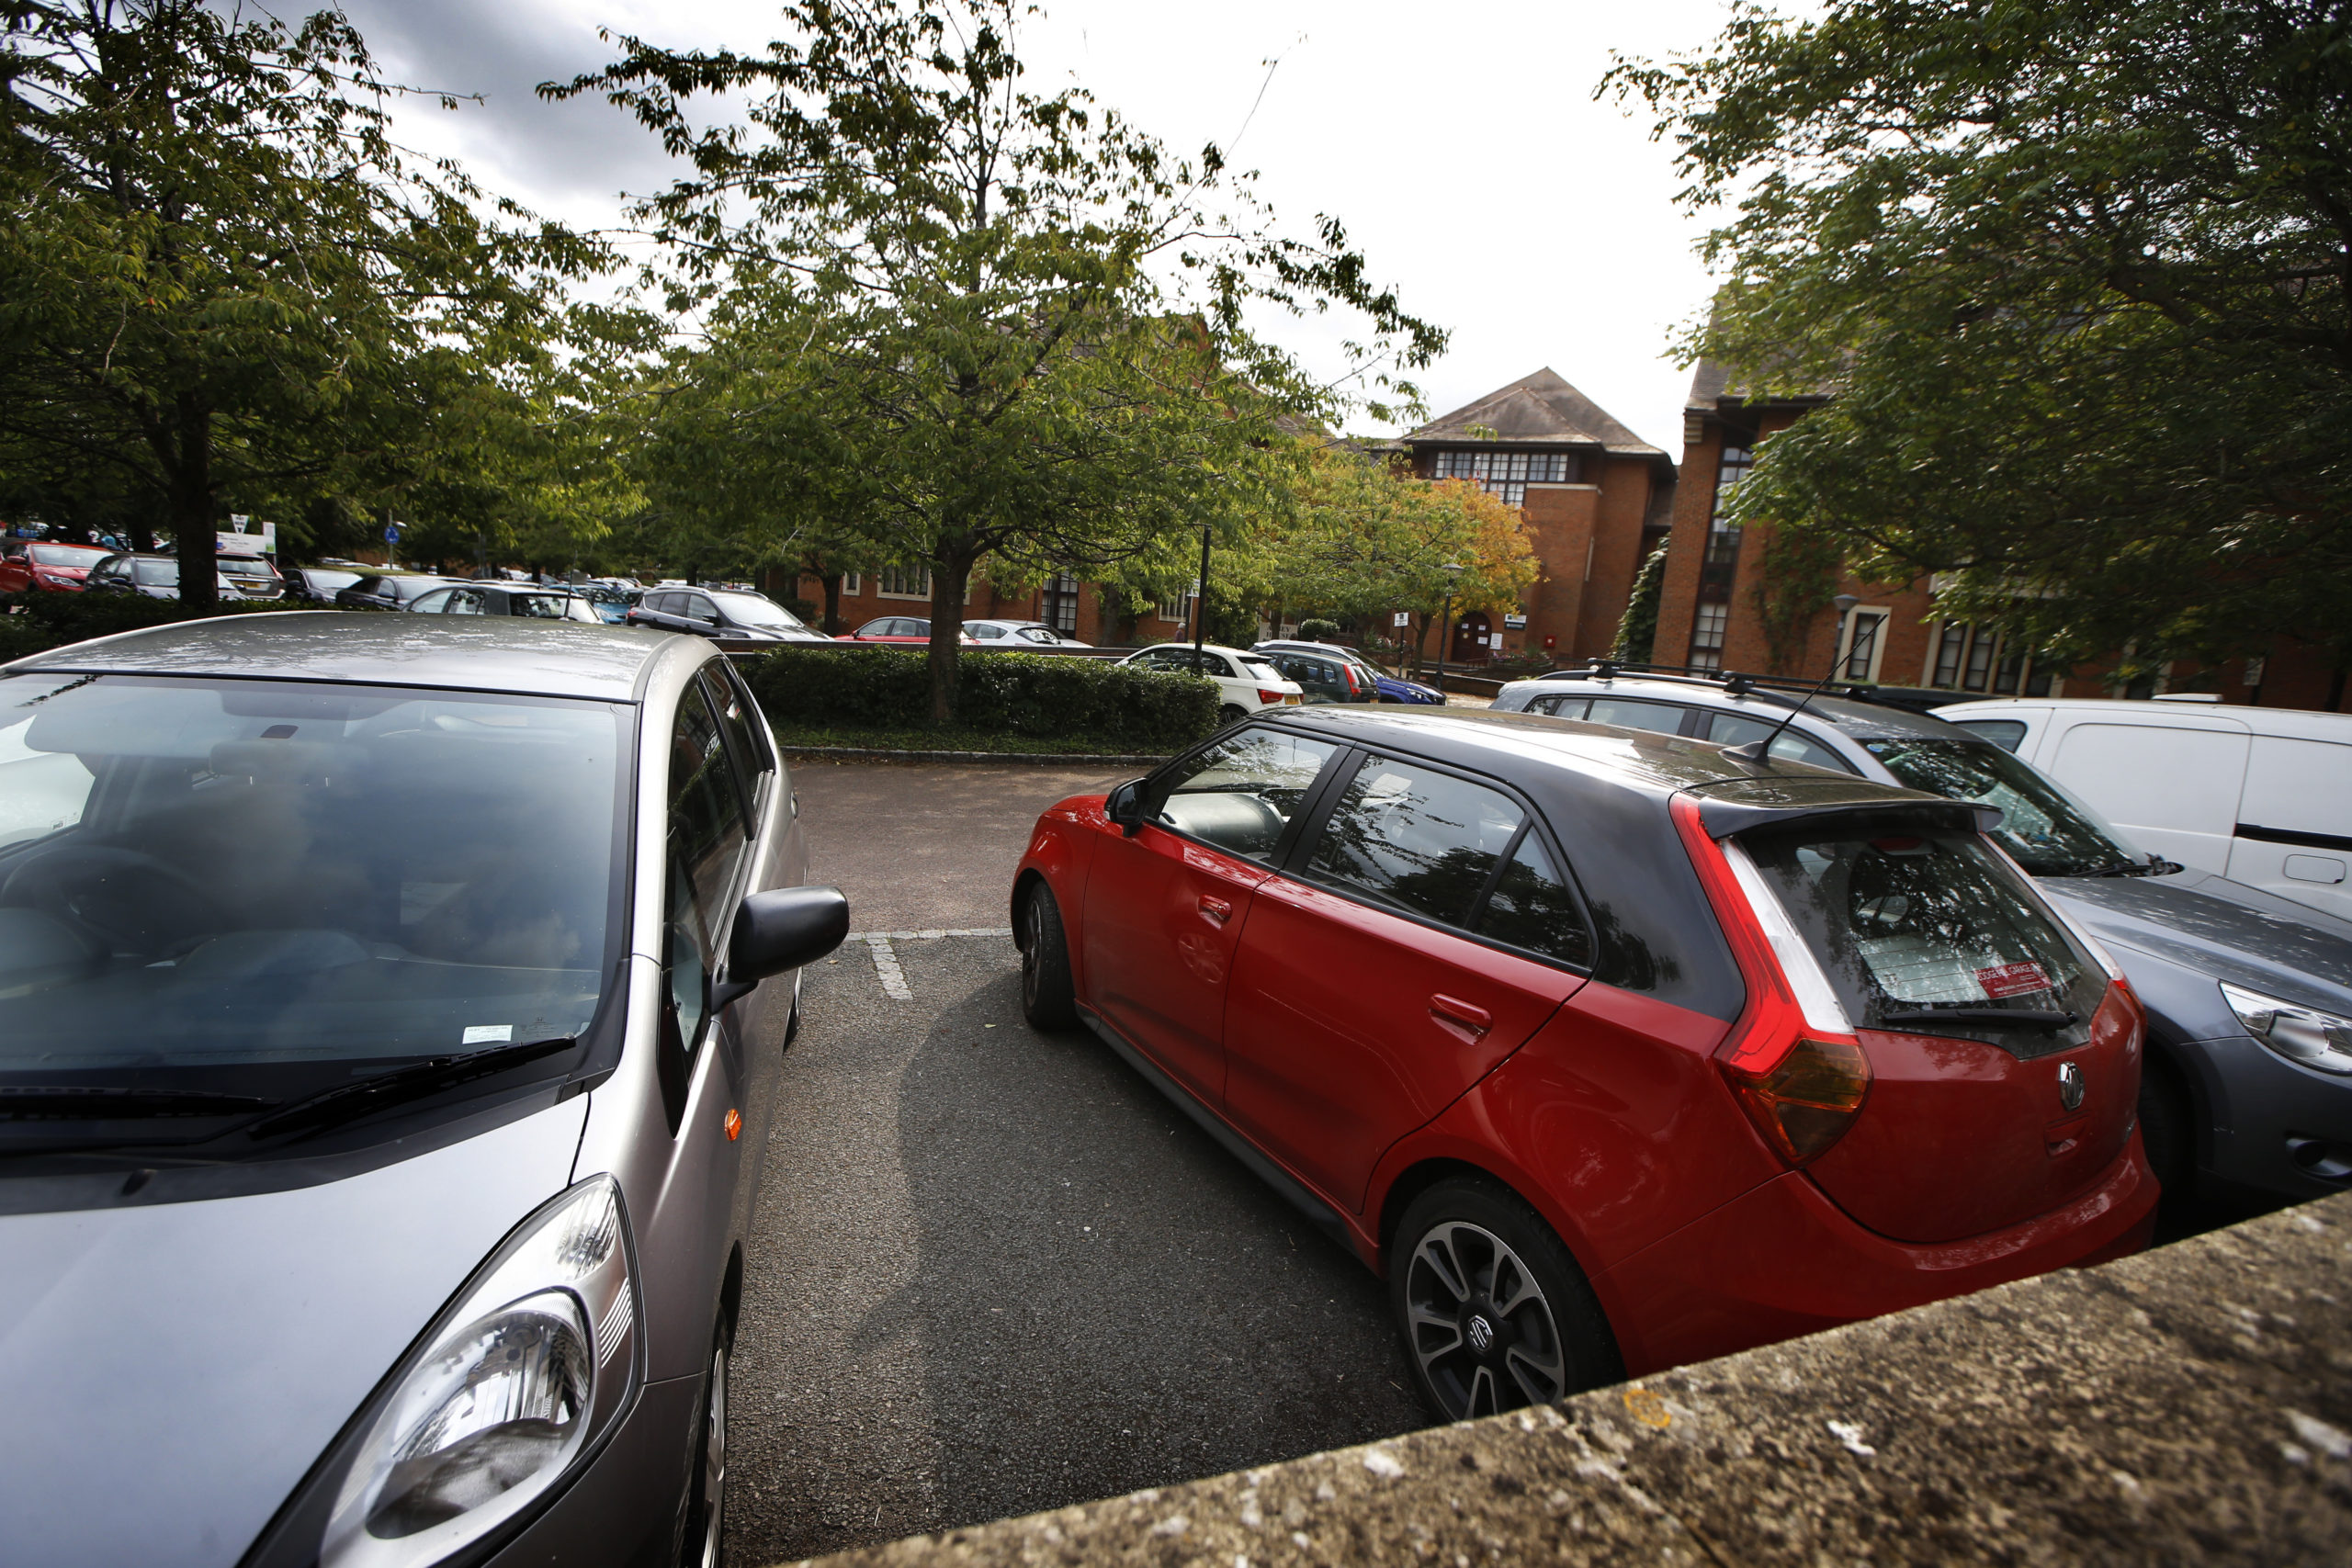 Changes to Vale parking arrangements confirmed following public consultation